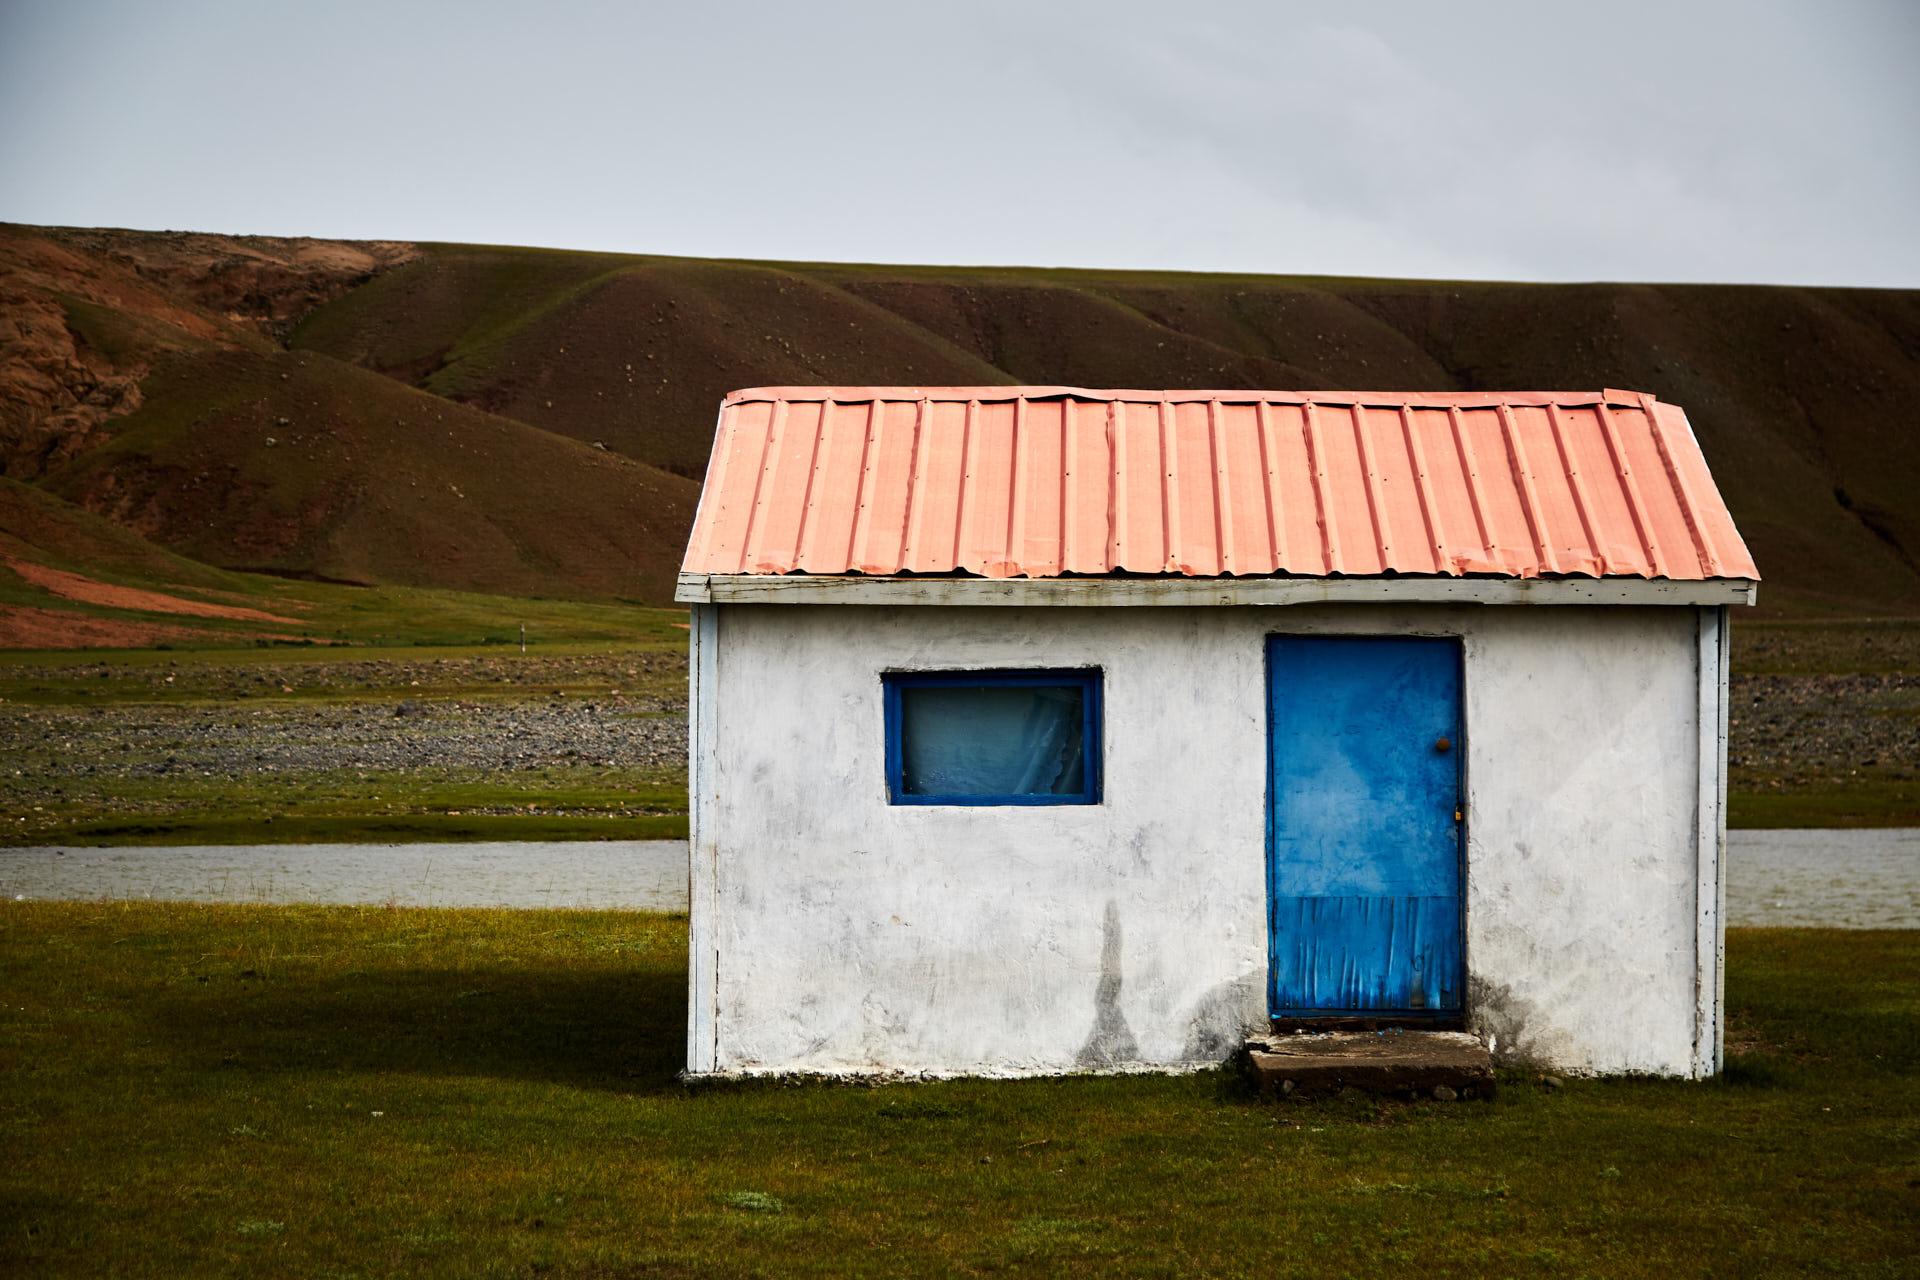 Maison mongole